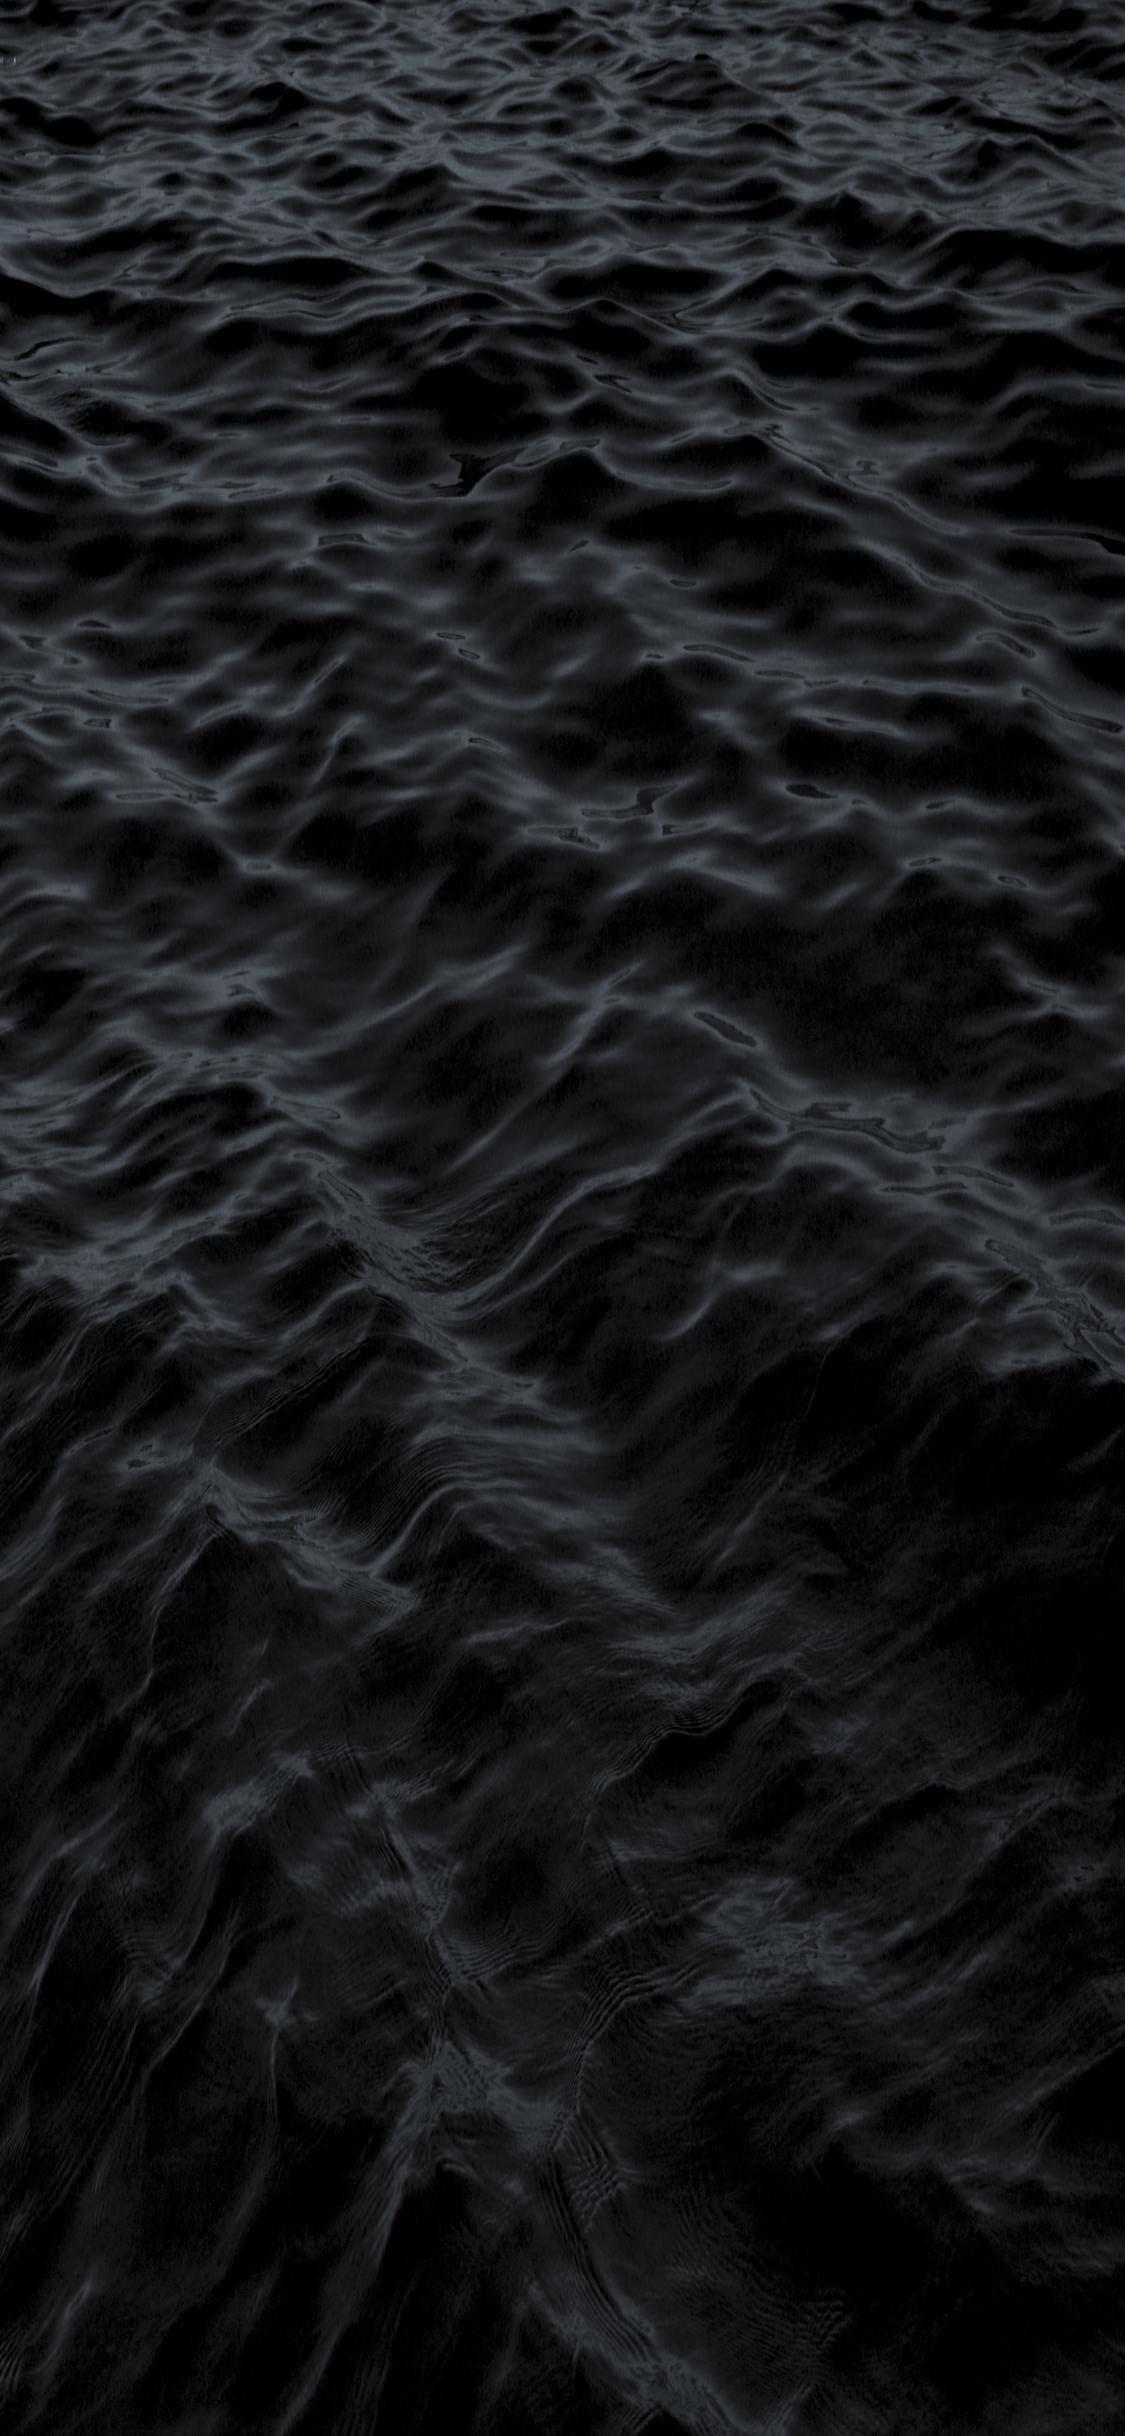 Black Wallpaper 4k Hd For Iphone In 2020 Black Wallpaper Dark Desktop Backgrounds Black And White Wallpaper